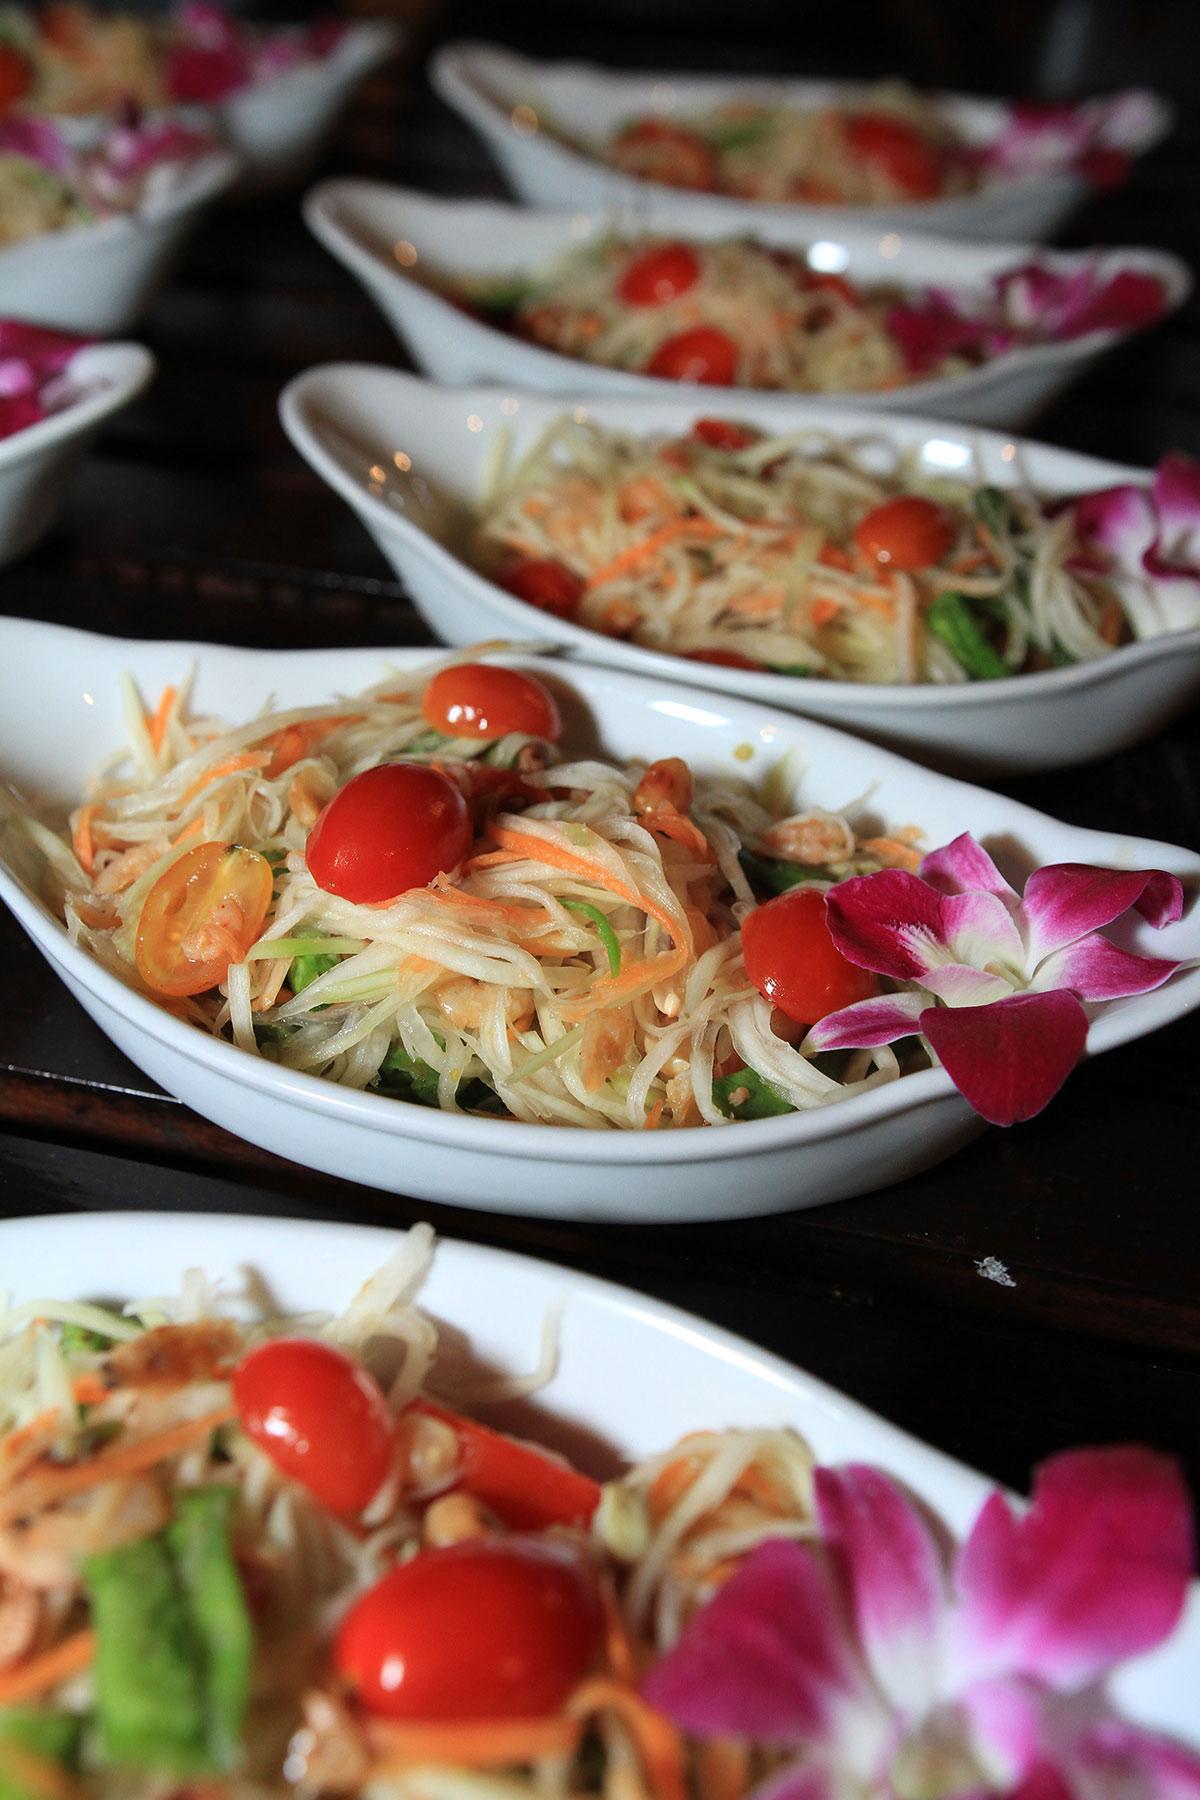 Organisation-Mariage-marier-maries-mariee-ceremonie-Thailande-Plage-ile-Koh-Samui-Island-thai-evenementiel-evenements-demande-fiancailles-EVJF-EVG-noces-voyages-Wedding-ceremony-Planner-Thailand-Beach-Events-event-request-bachelor-bachelorette-groom-bride-bridal-diner-dinner-celebratin-food-chef-delicious-2